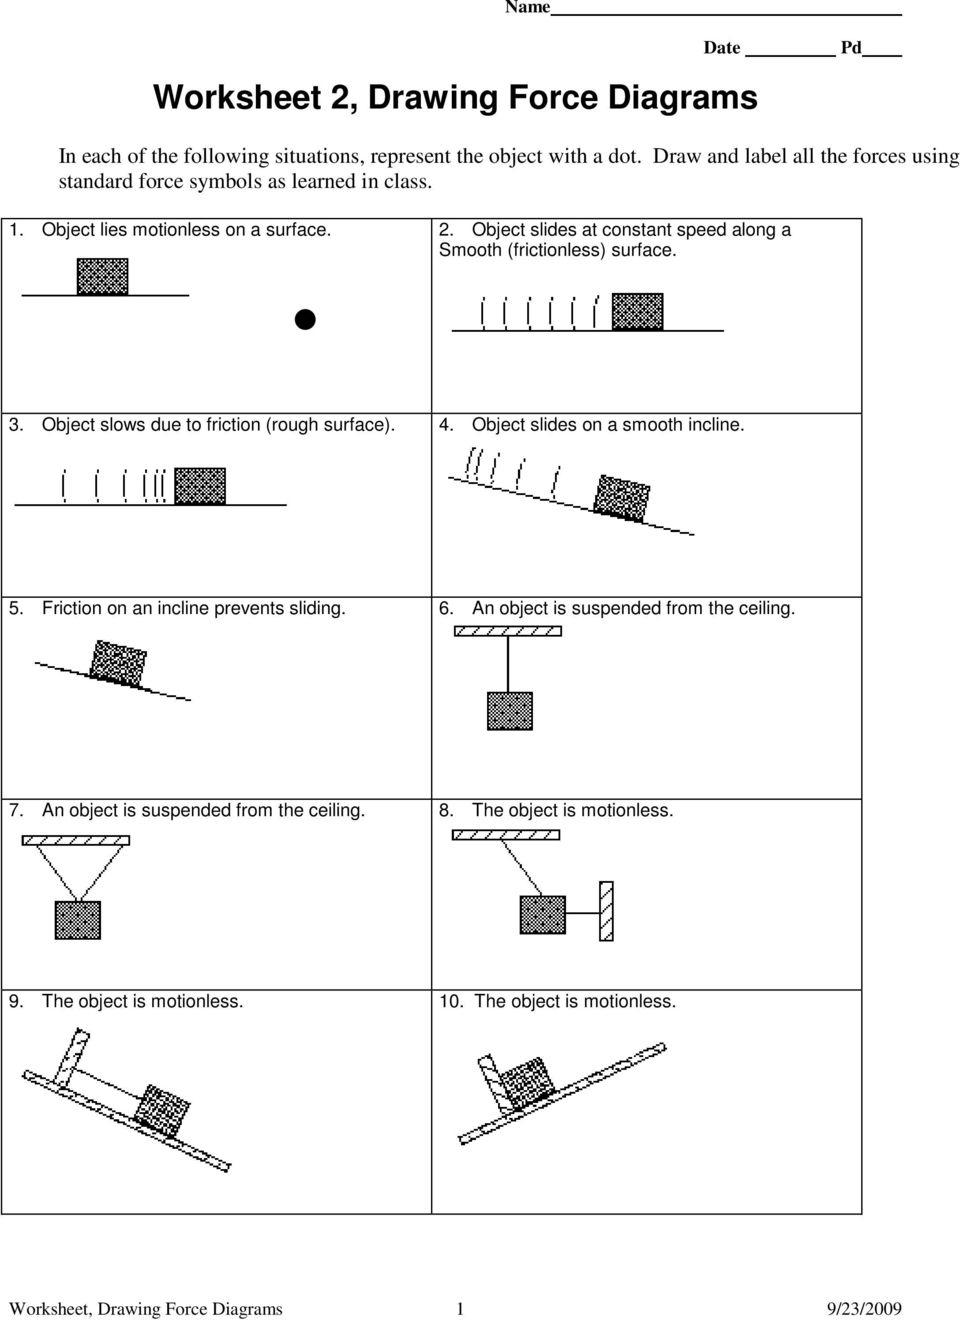 Worksheet 1 Free Body Or Force Diagrams Pdf